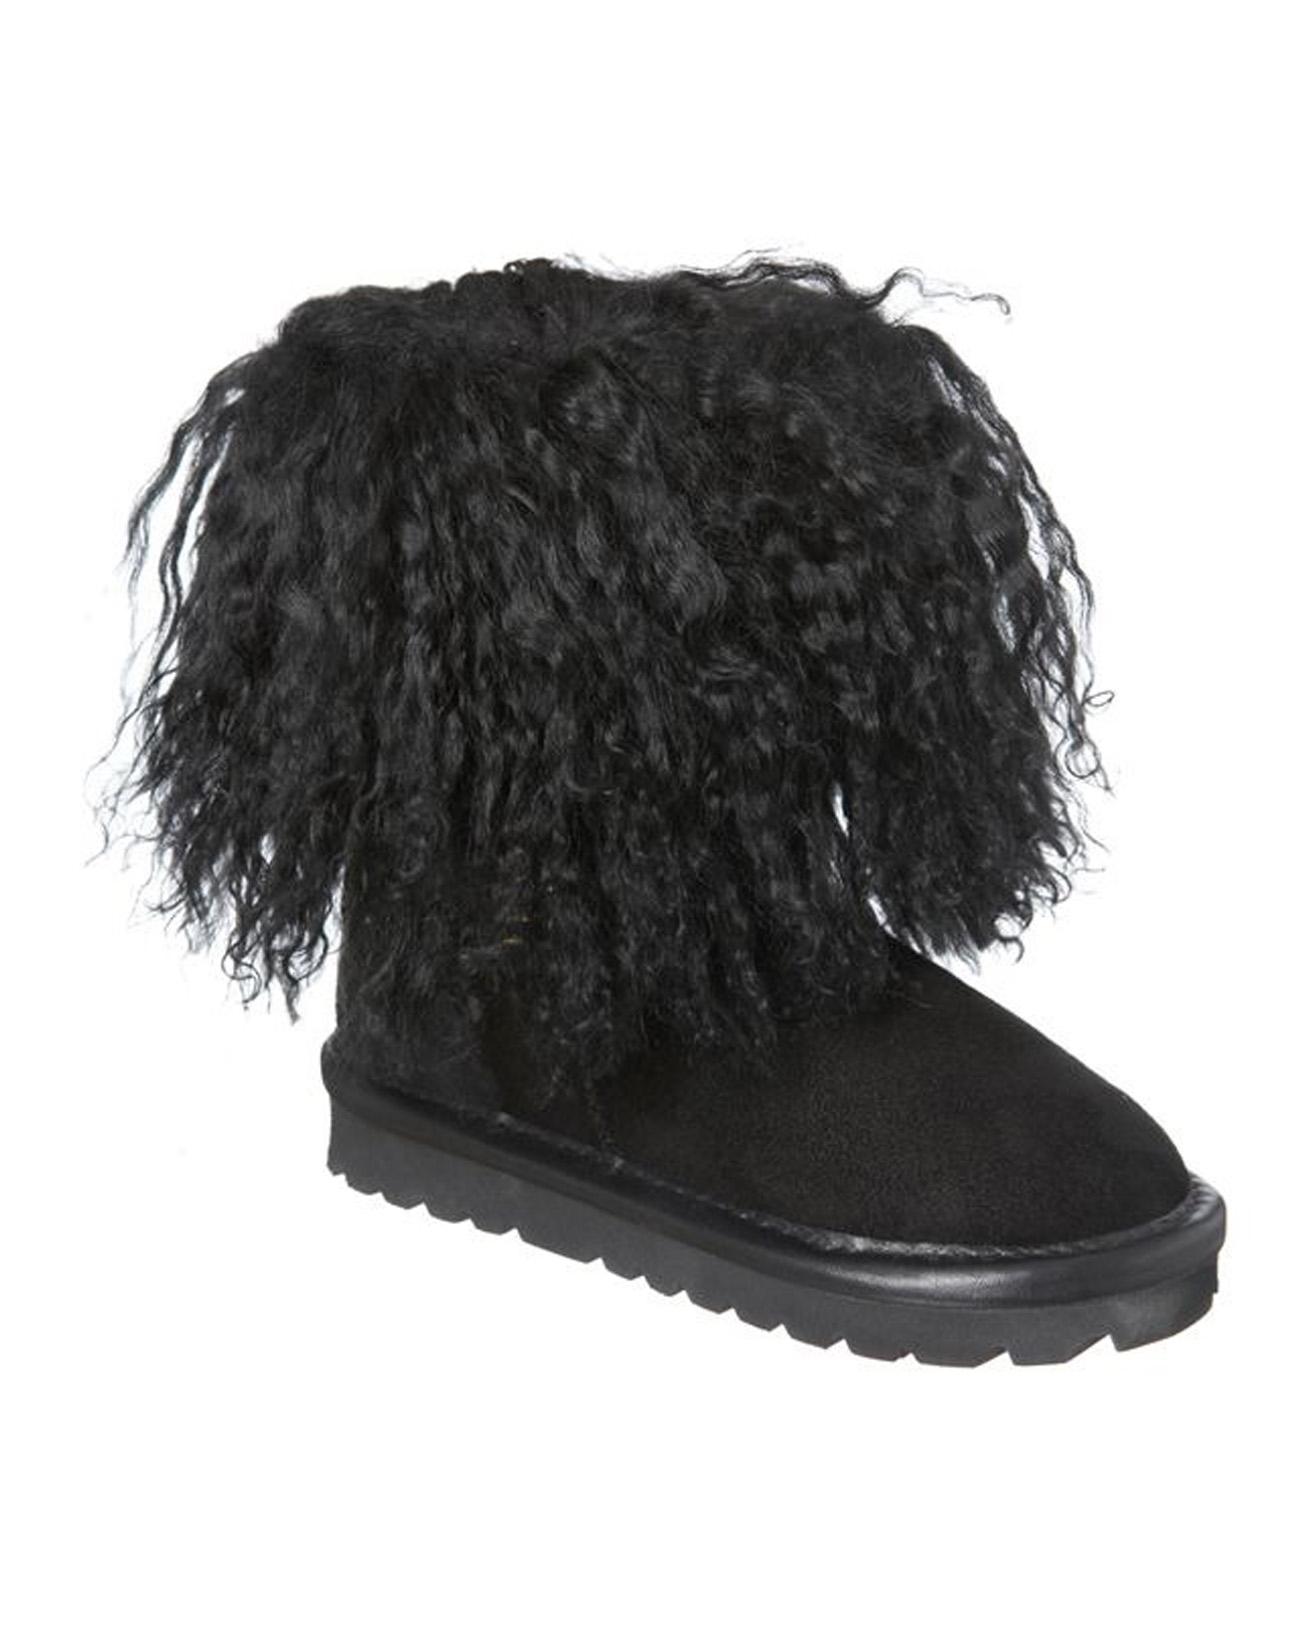 Kids Mongolian Boots - Size 5-6 - Black - 529